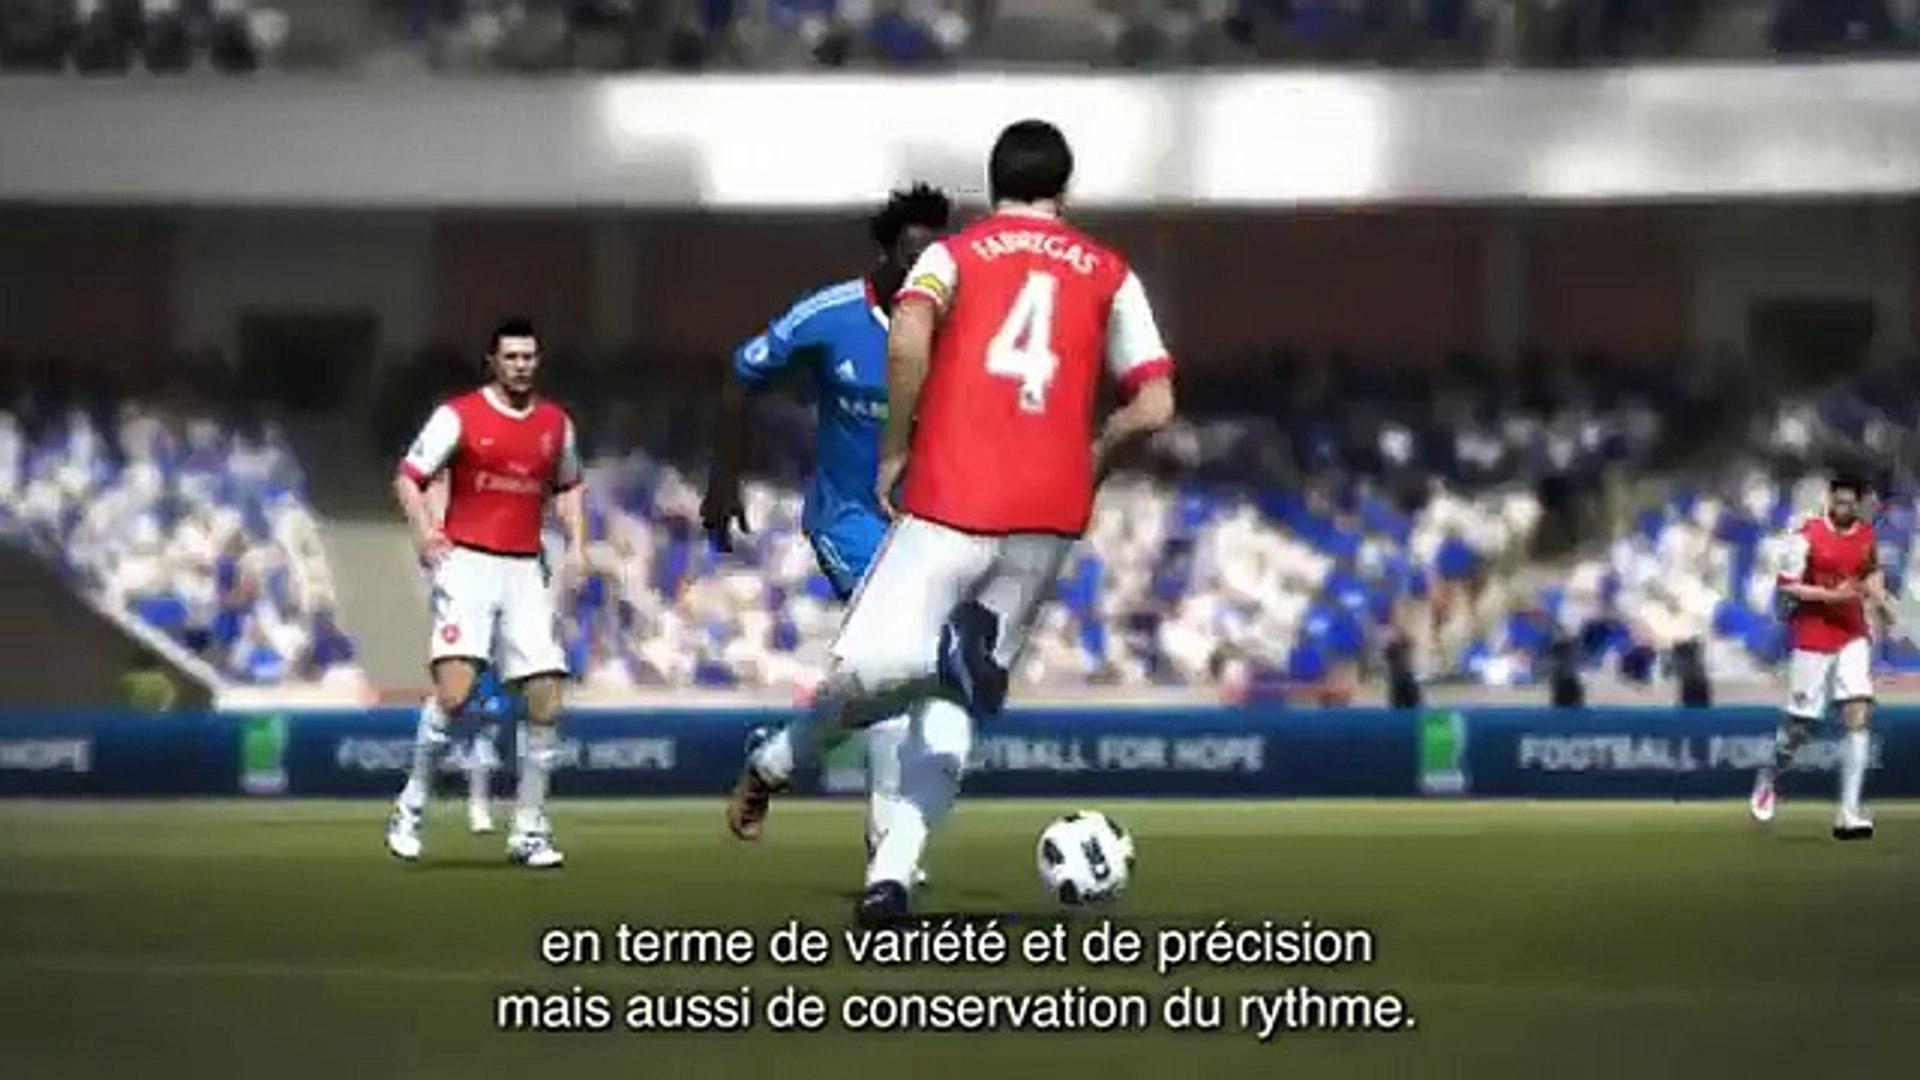 Fifa 12 - Trailer 1 - Fifa soccer 12 Player Impact Trailer - Trailer